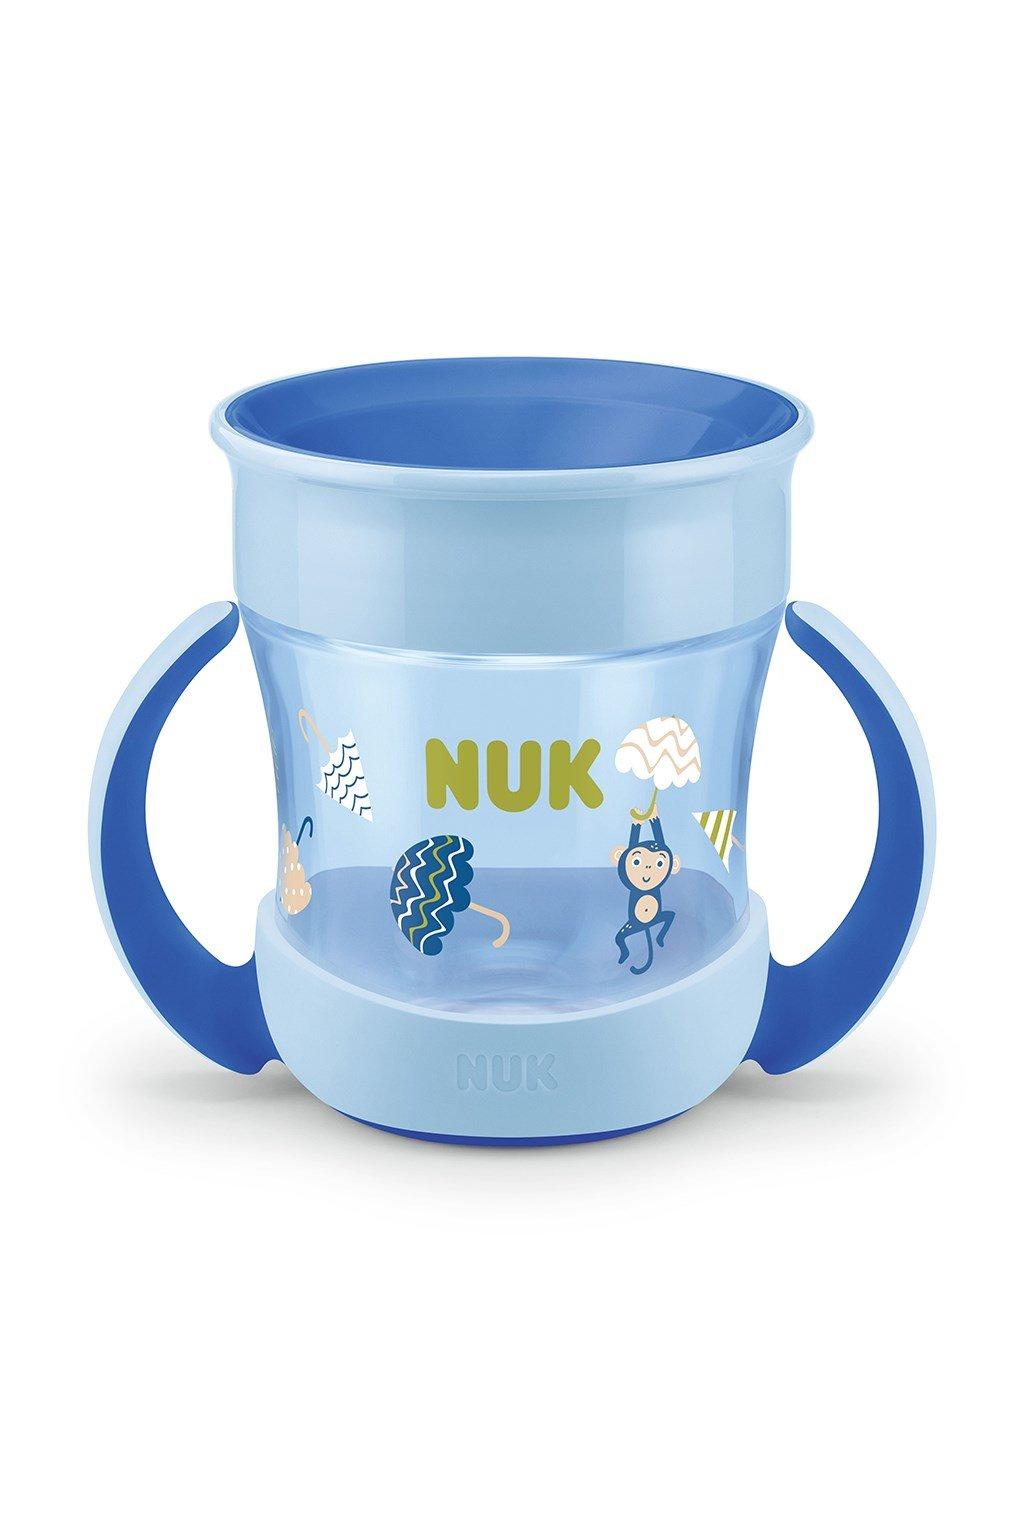 Detský hrnček Mini Magic NUK 360 ° s viečkom modrý